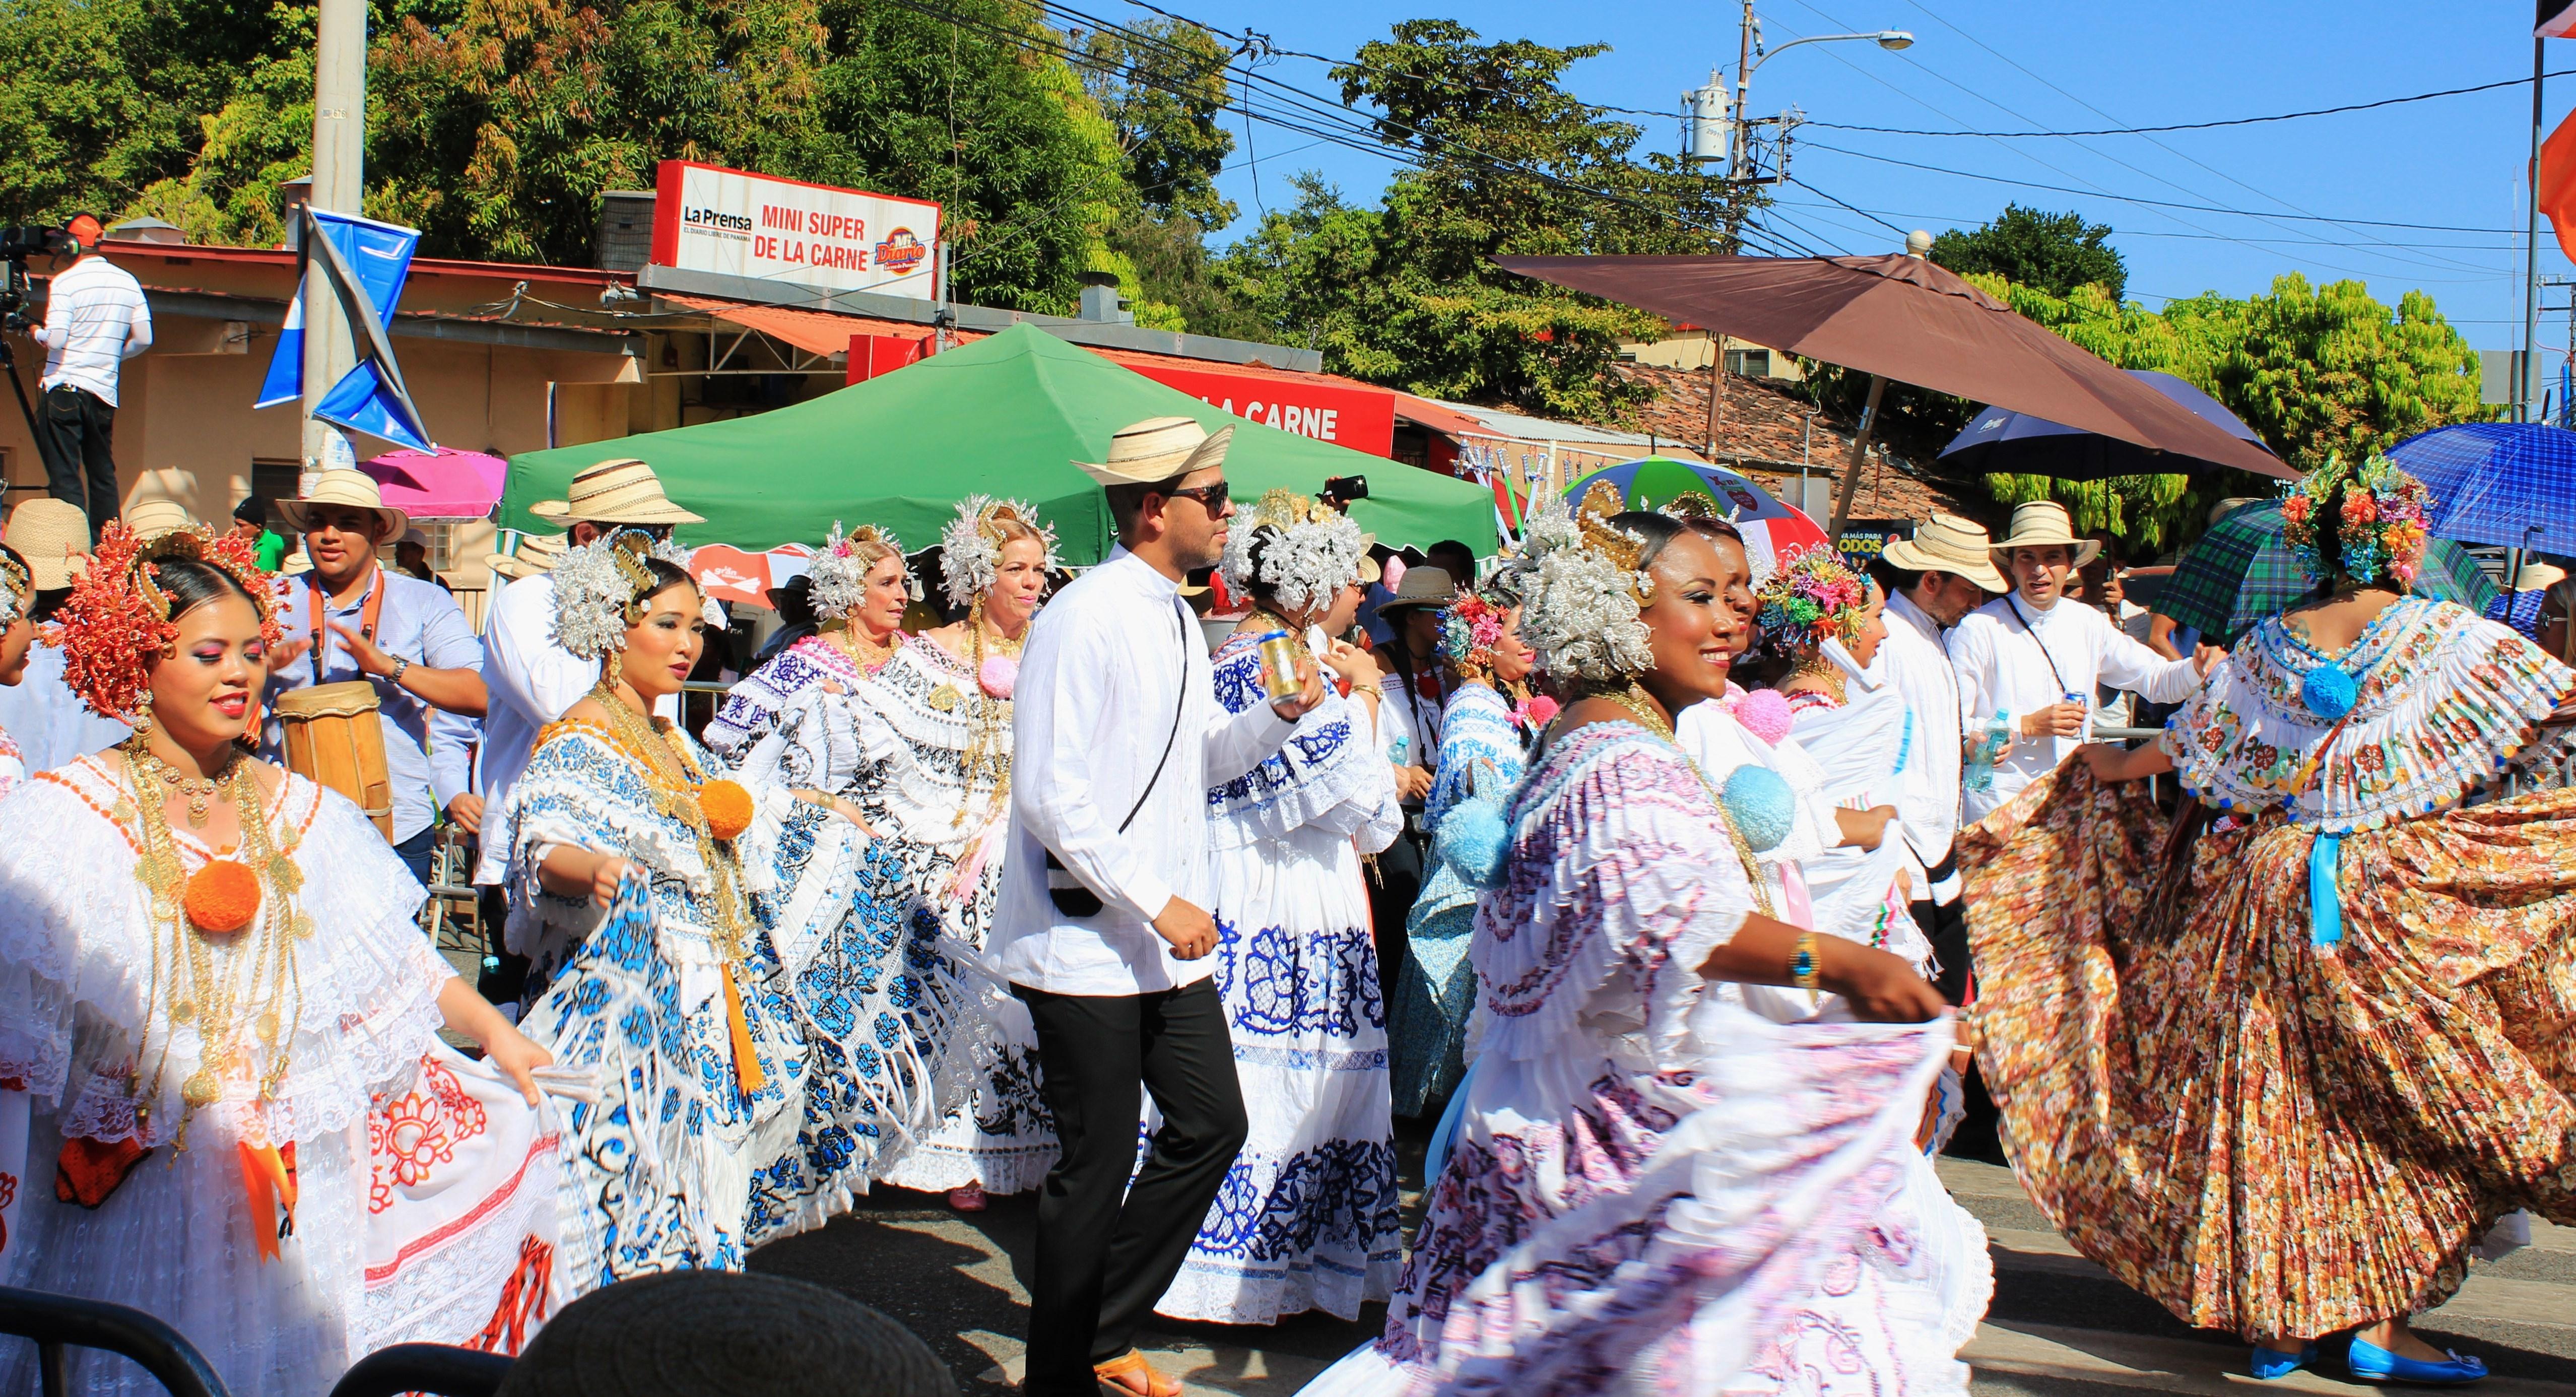 swirling-skirts-pollera-parade-5 A Panama Road Trip Panama Panama Fairs and Festivals